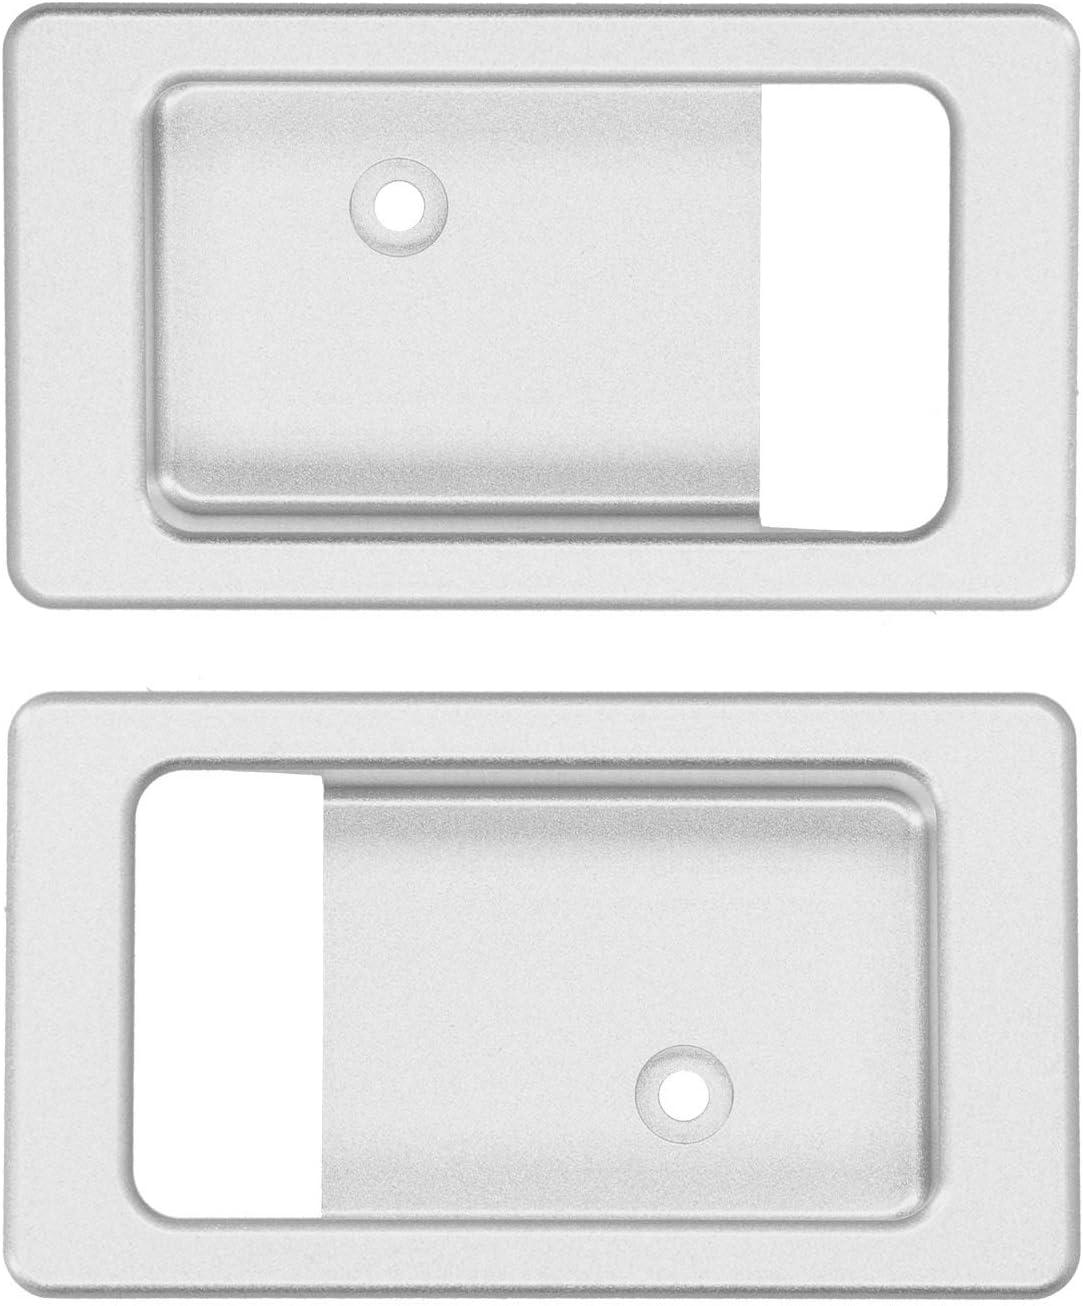 2Pcs Interior Door Handle Alloy Bowl Aluminium Complete Free Shipping Popular overseas Inner